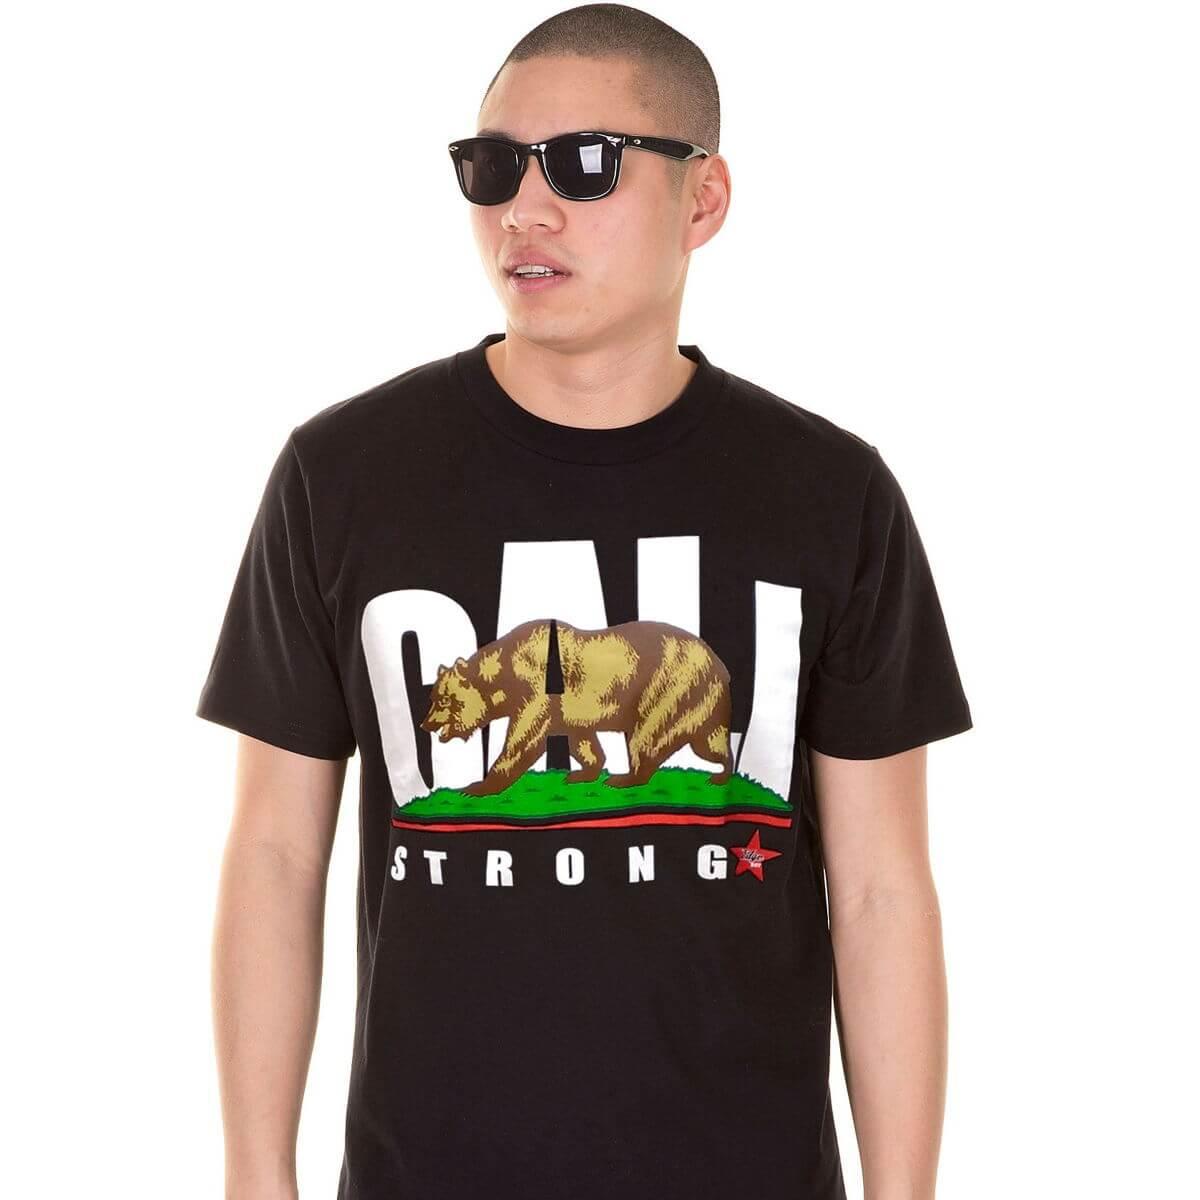 739157dbf51b3 Ochoa Boyz Sporting CALI Strong s Hit Heather T-shirt Line At Photo ...